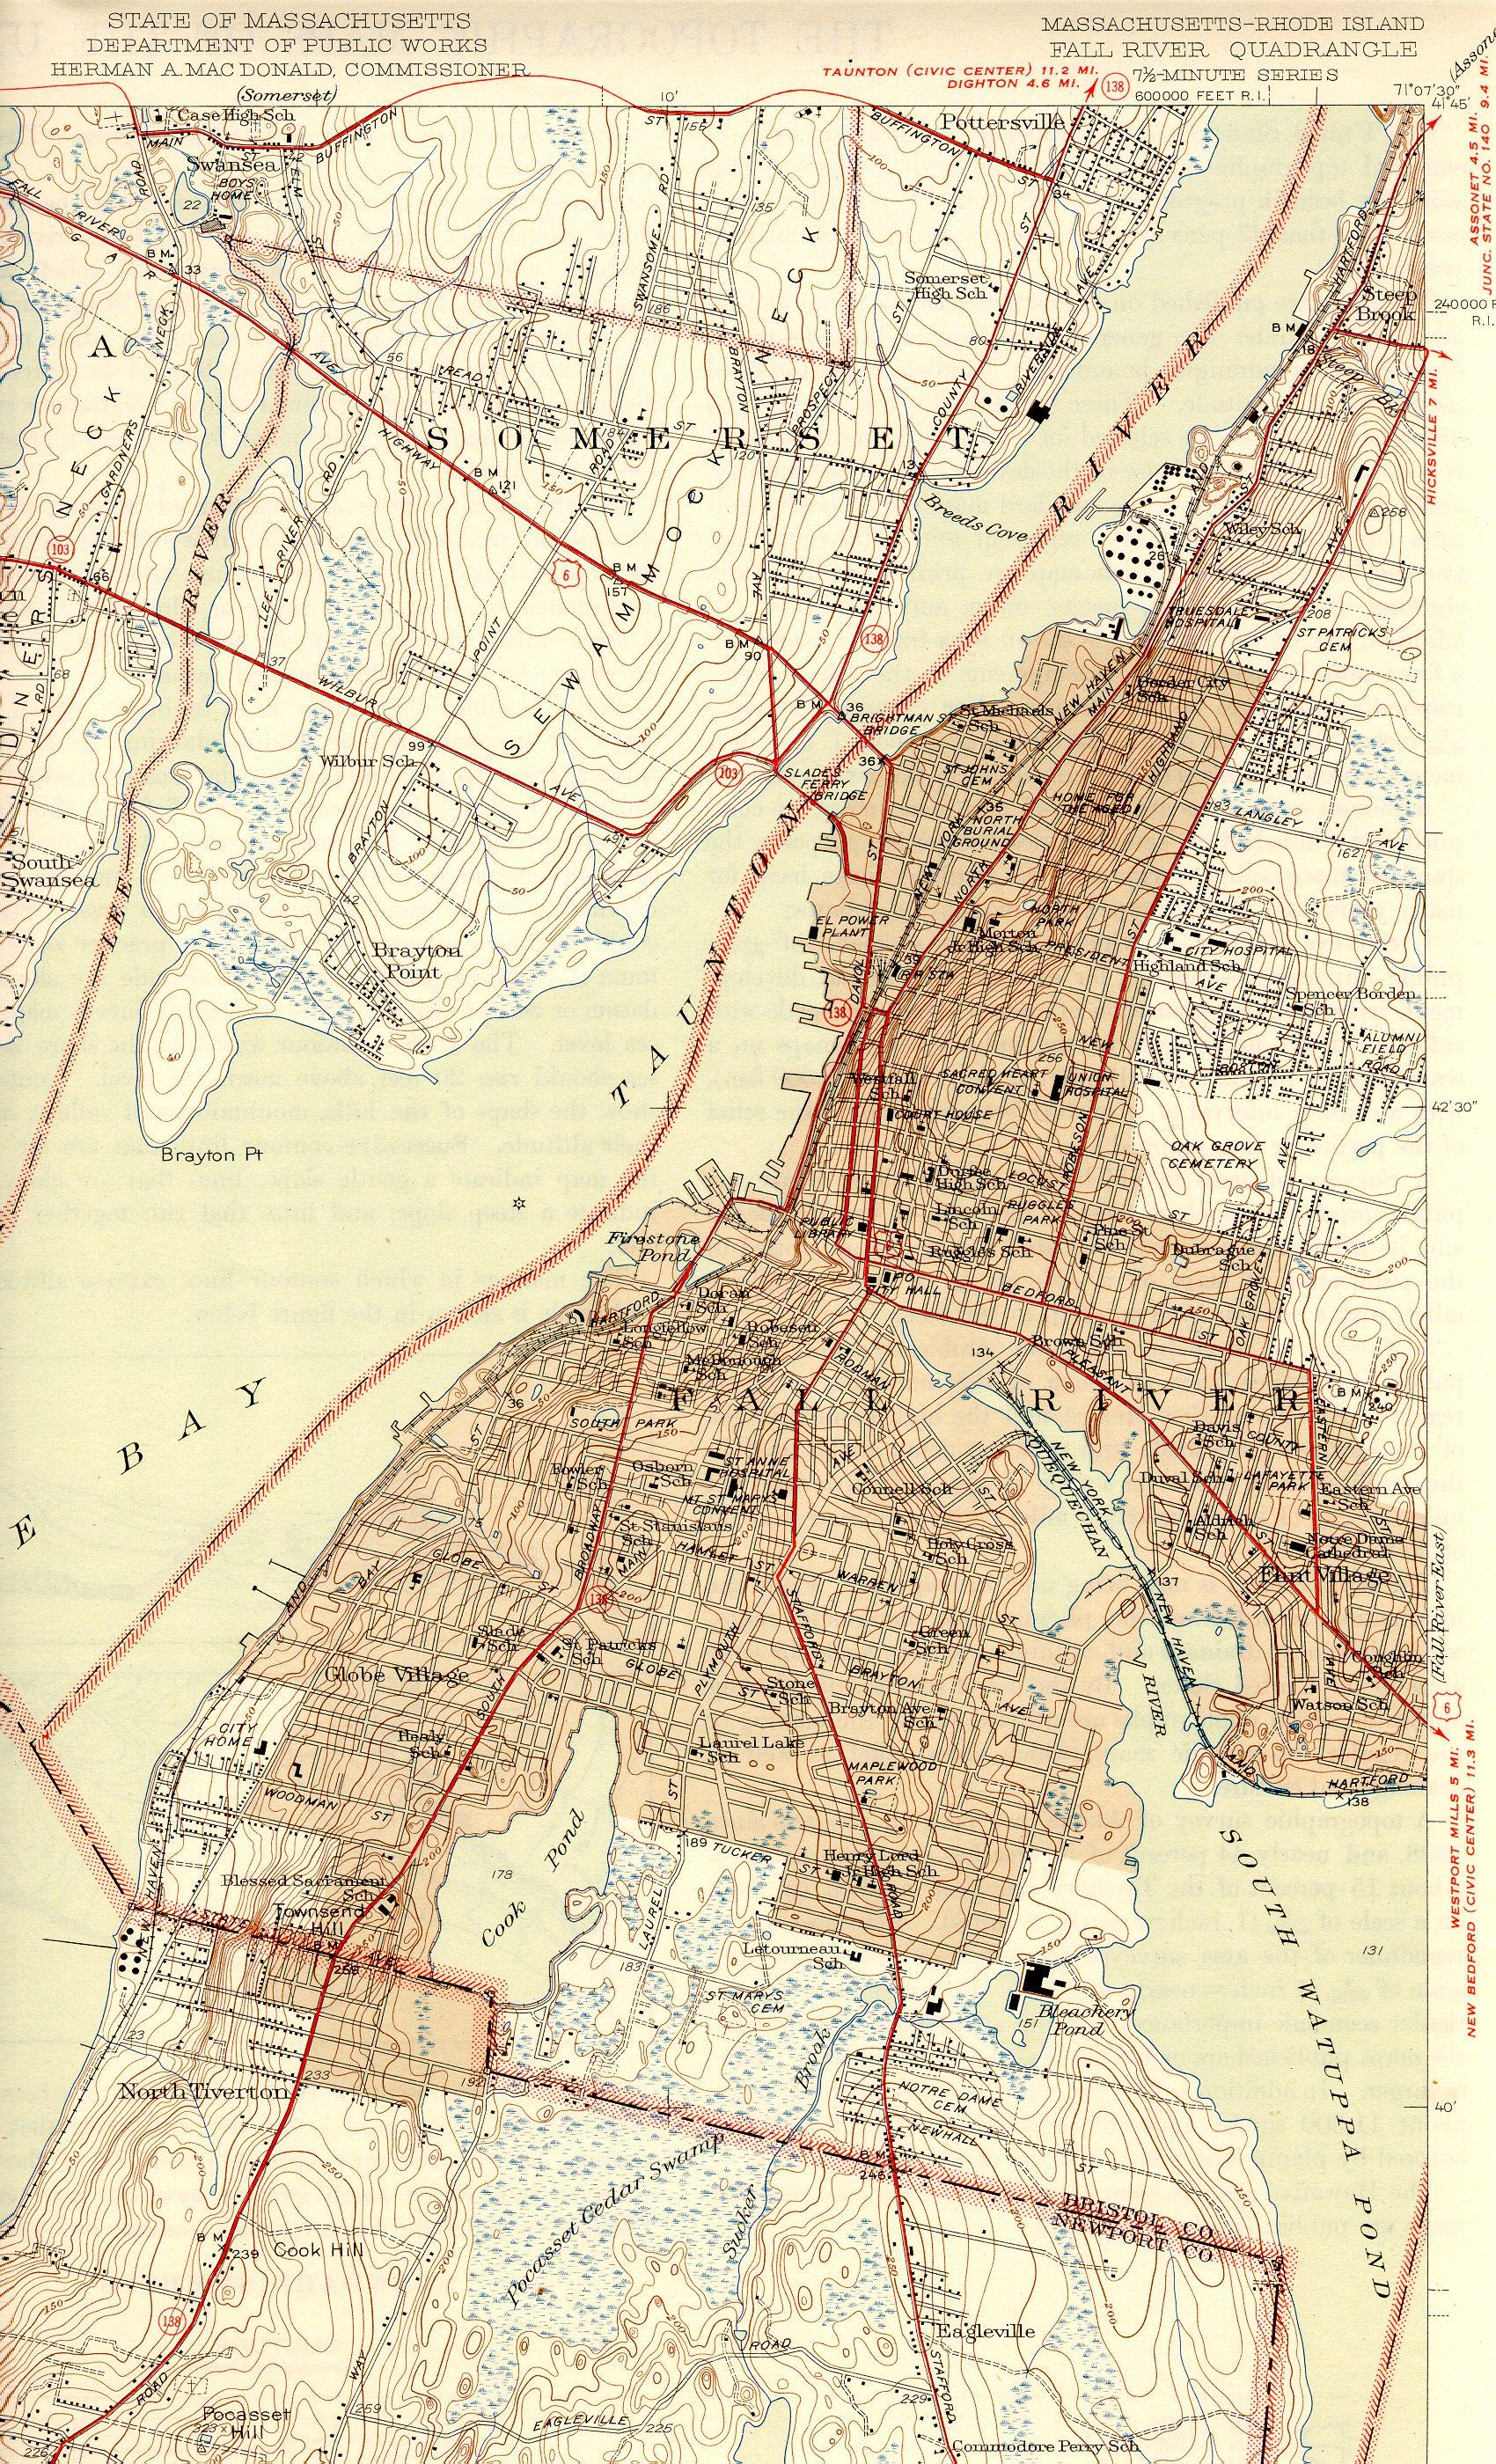 File:Quequechan River (Massachusetts) map.jpg - Wikimedia Commons